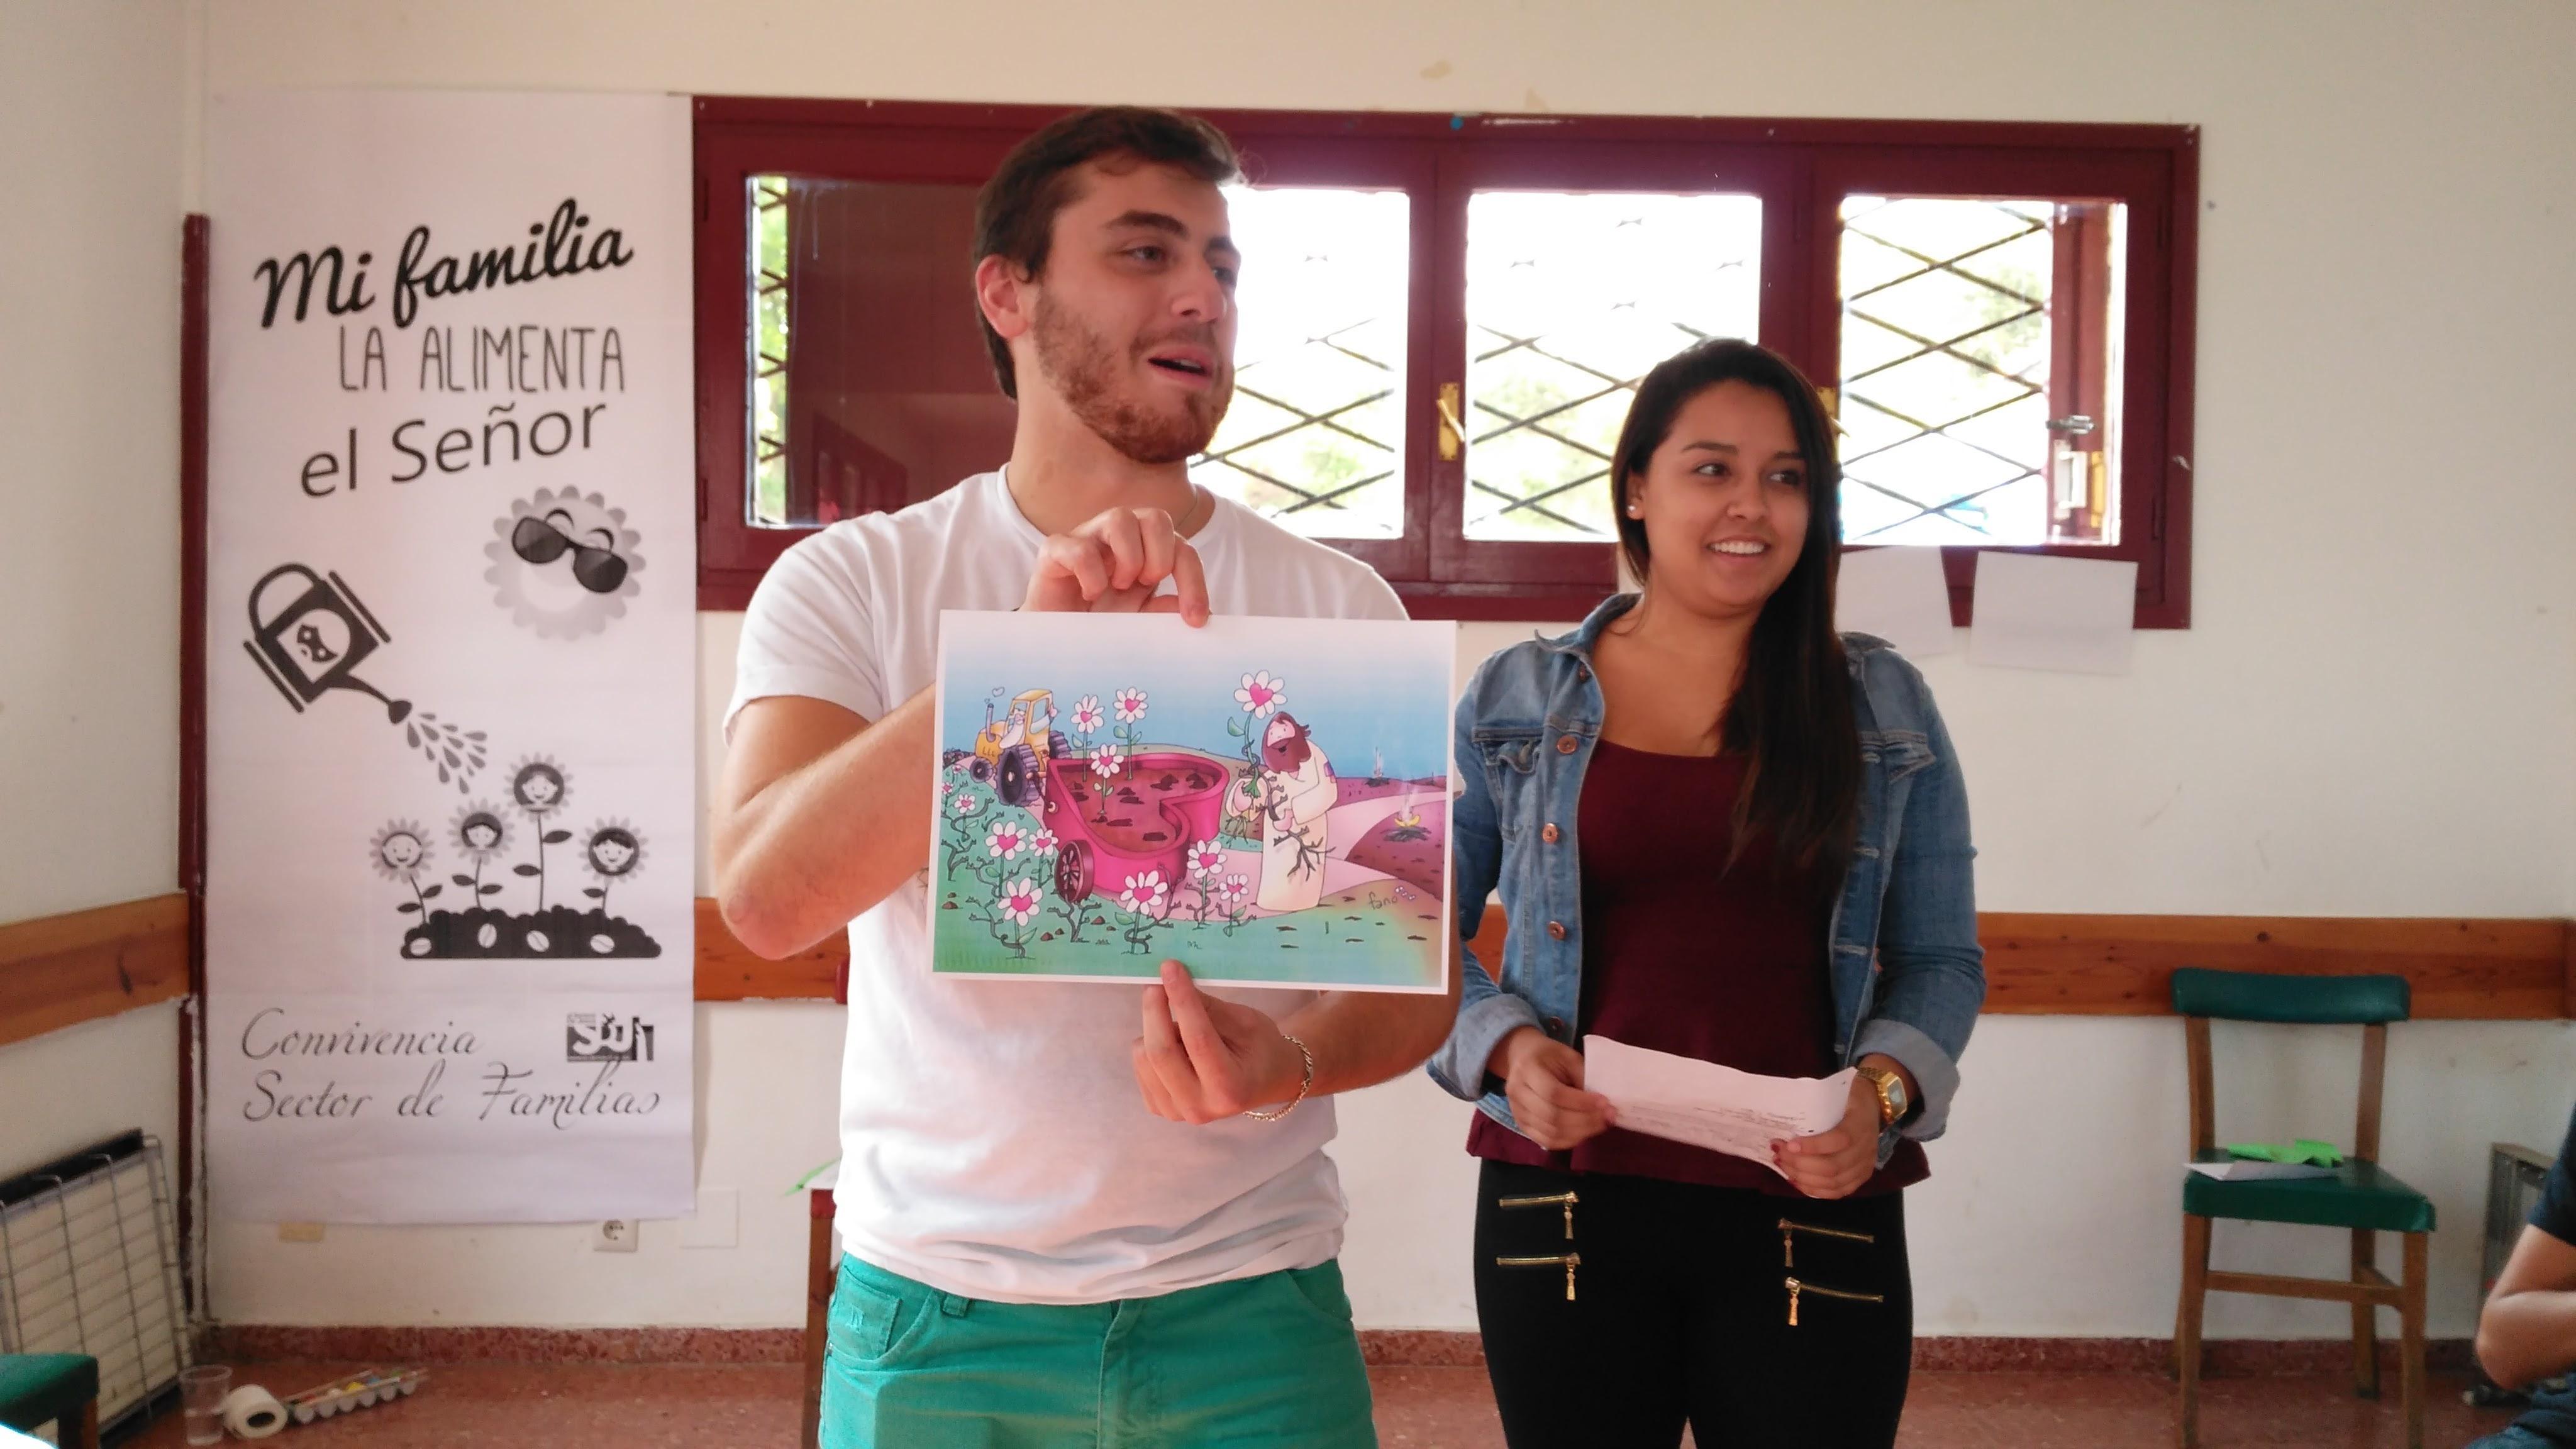 Picasa - 2015.09.12-13 - Convivencia Sector Familias(5).jpg